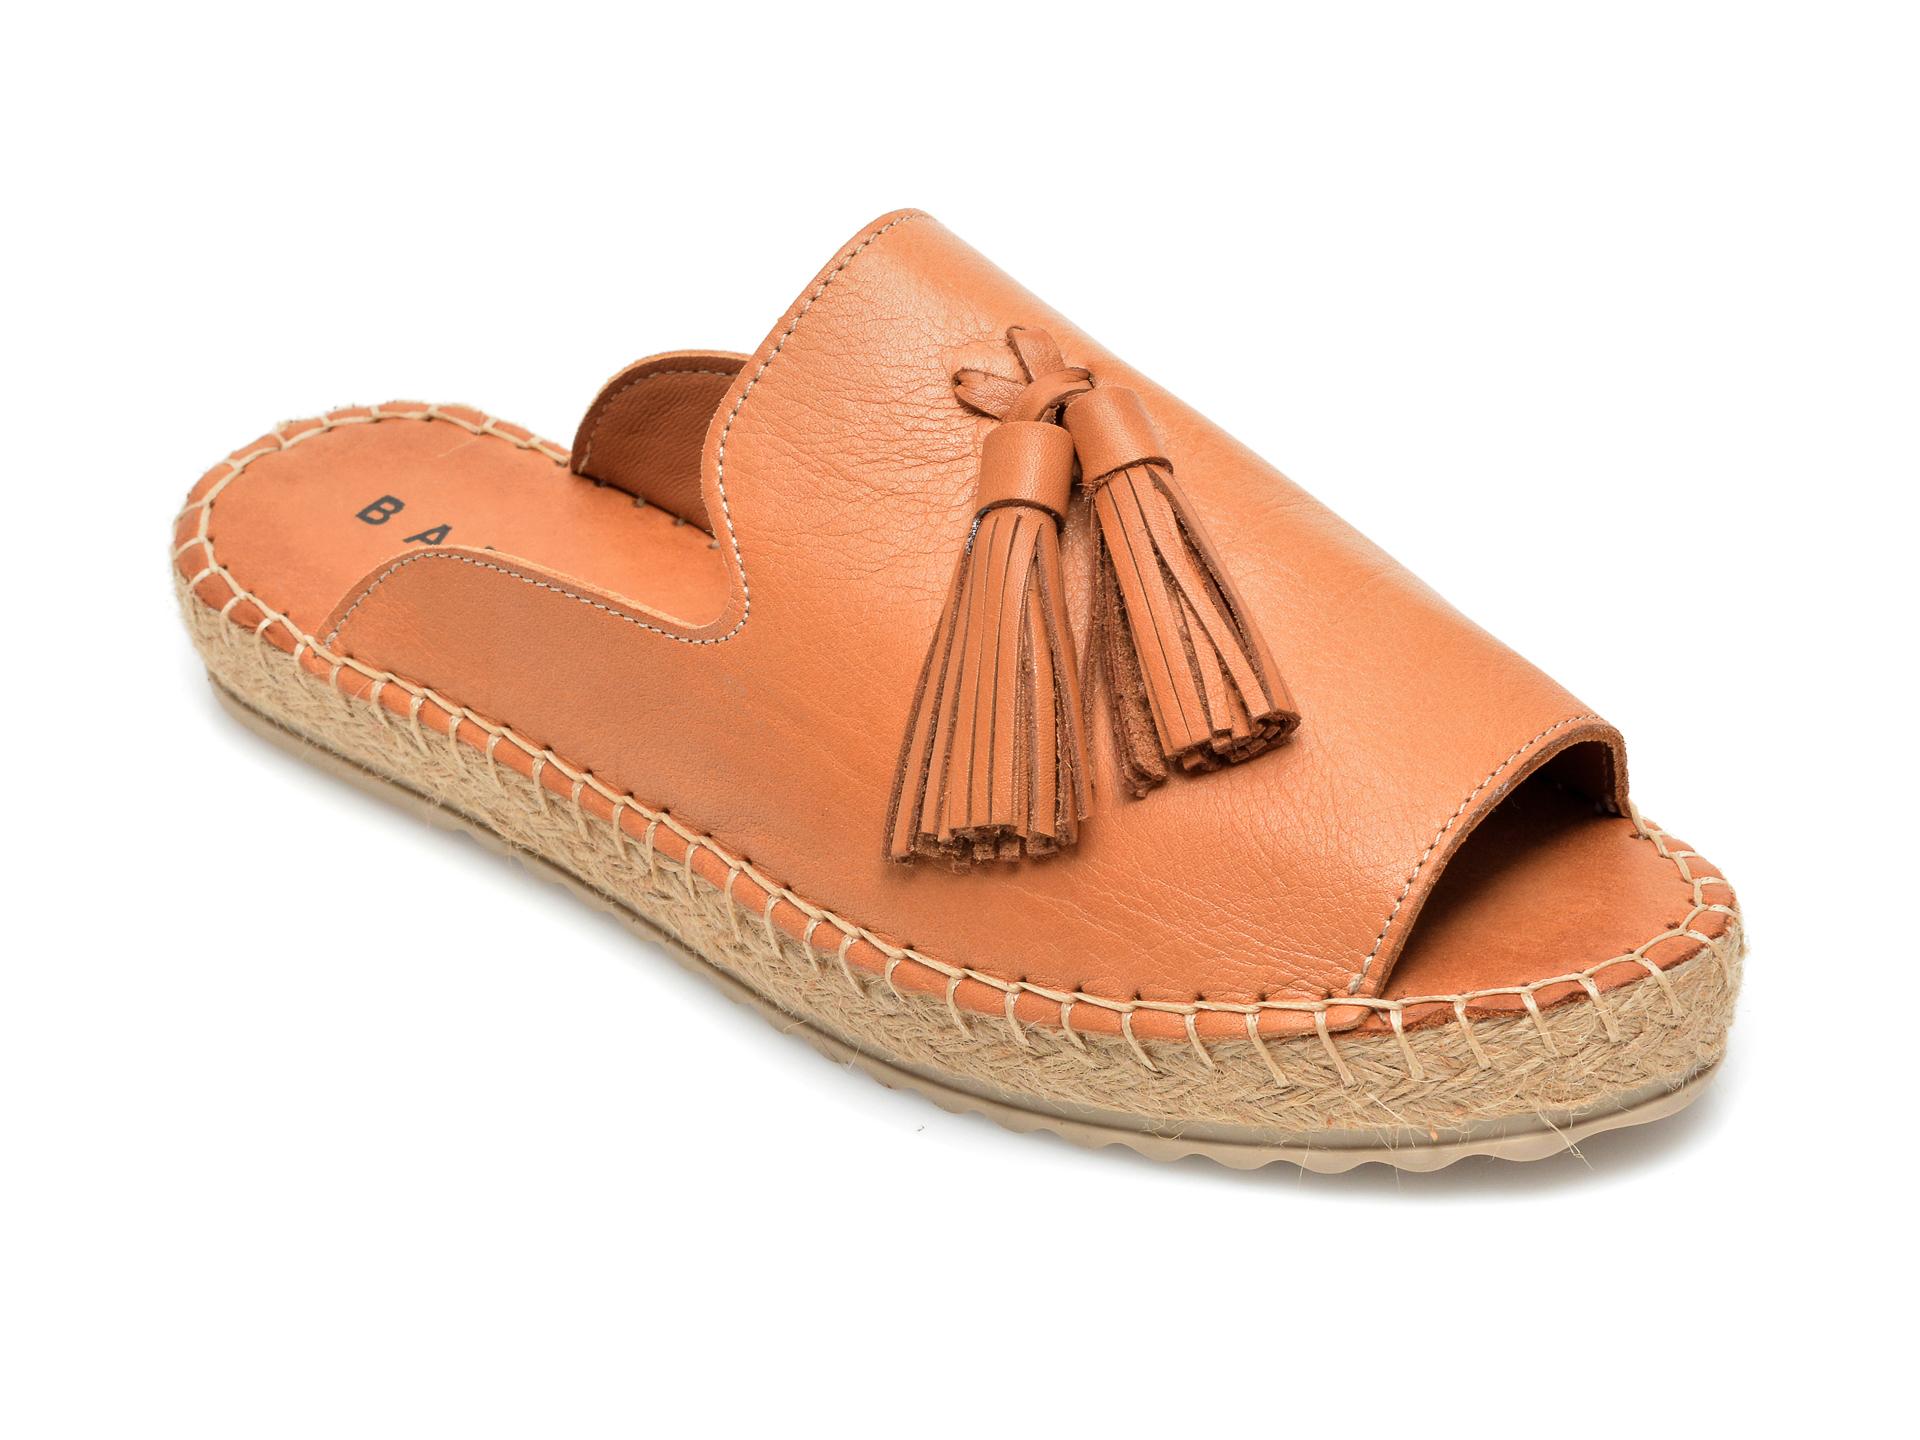 Papuci BABOOS maro, R07, din piele naturala imagine otter.ro